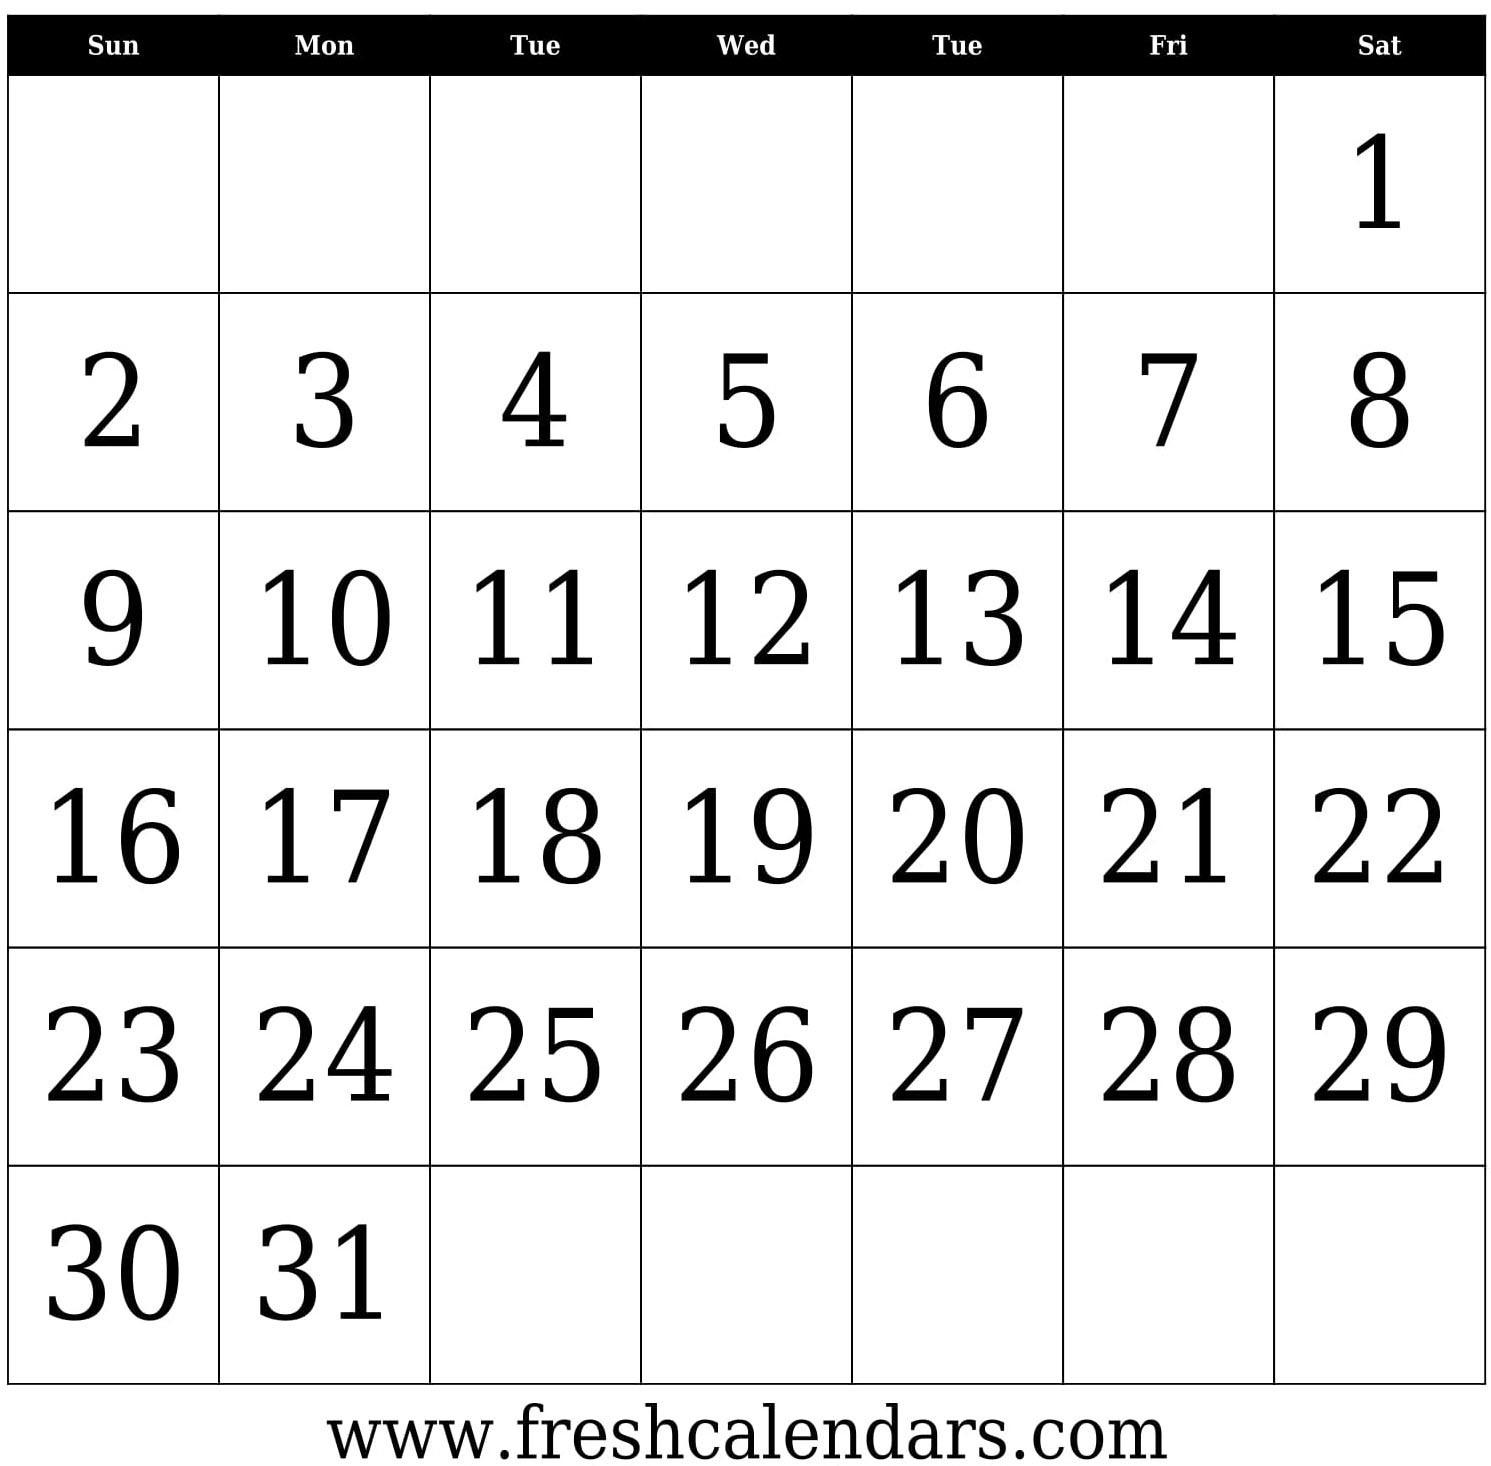 31 Days Blank Calendar Template Bold In To Edit | Thekpark-Hadong_Blank Calendar 31 Days